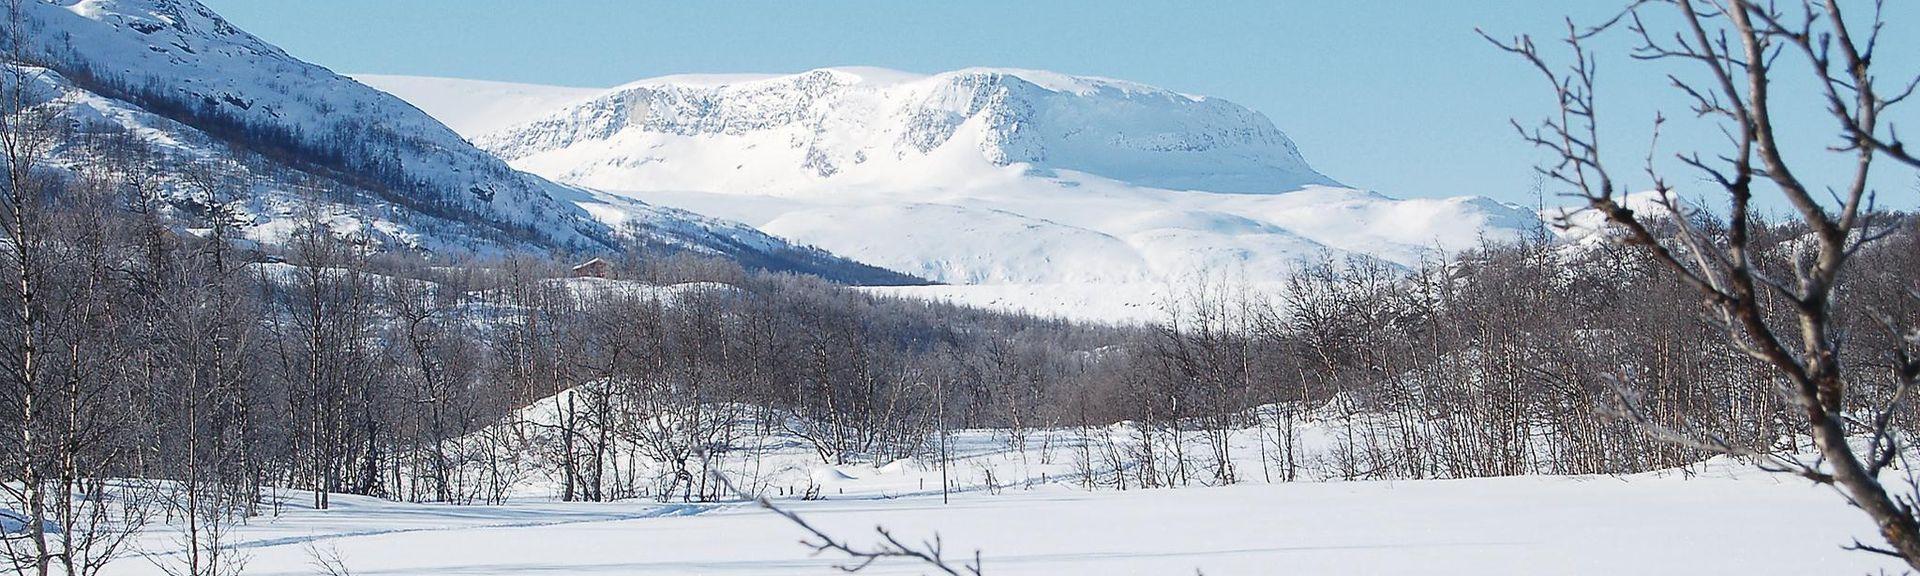 Geilo, Buskerud, Norway